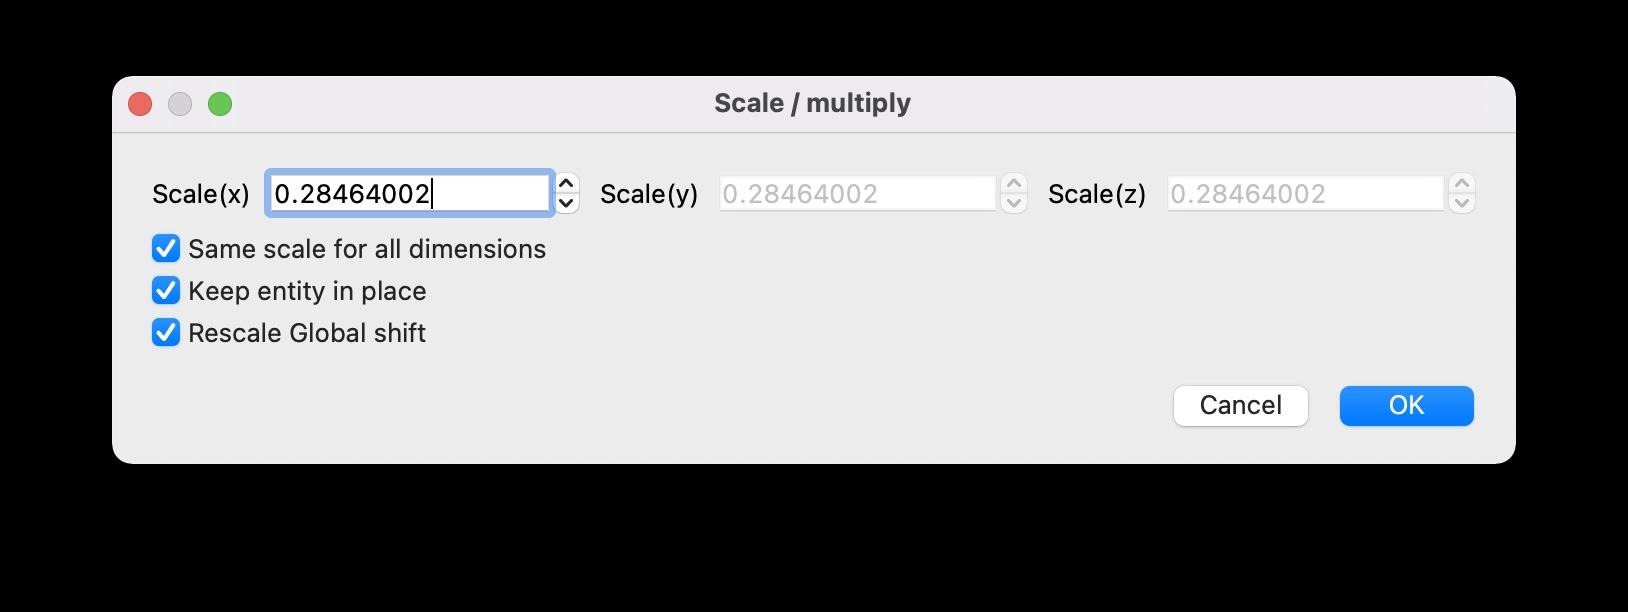 CloudCompare scale-multiply image